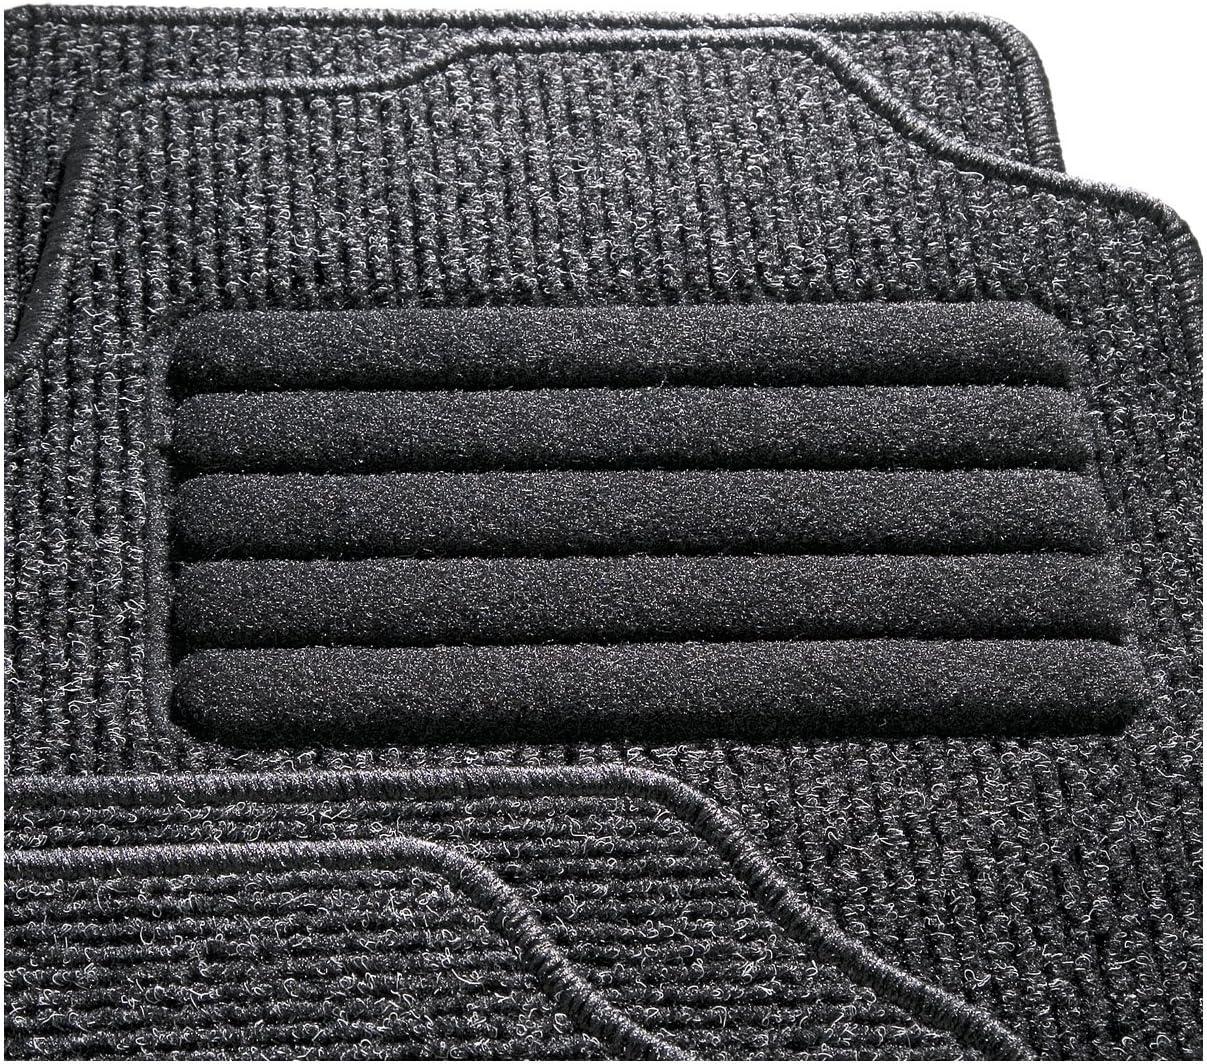 4-Piezas CarFashion 255139 Auto Alfombra Soporte sin Juego de alfombrillas para Matte plana BasicRips-Textil Negro